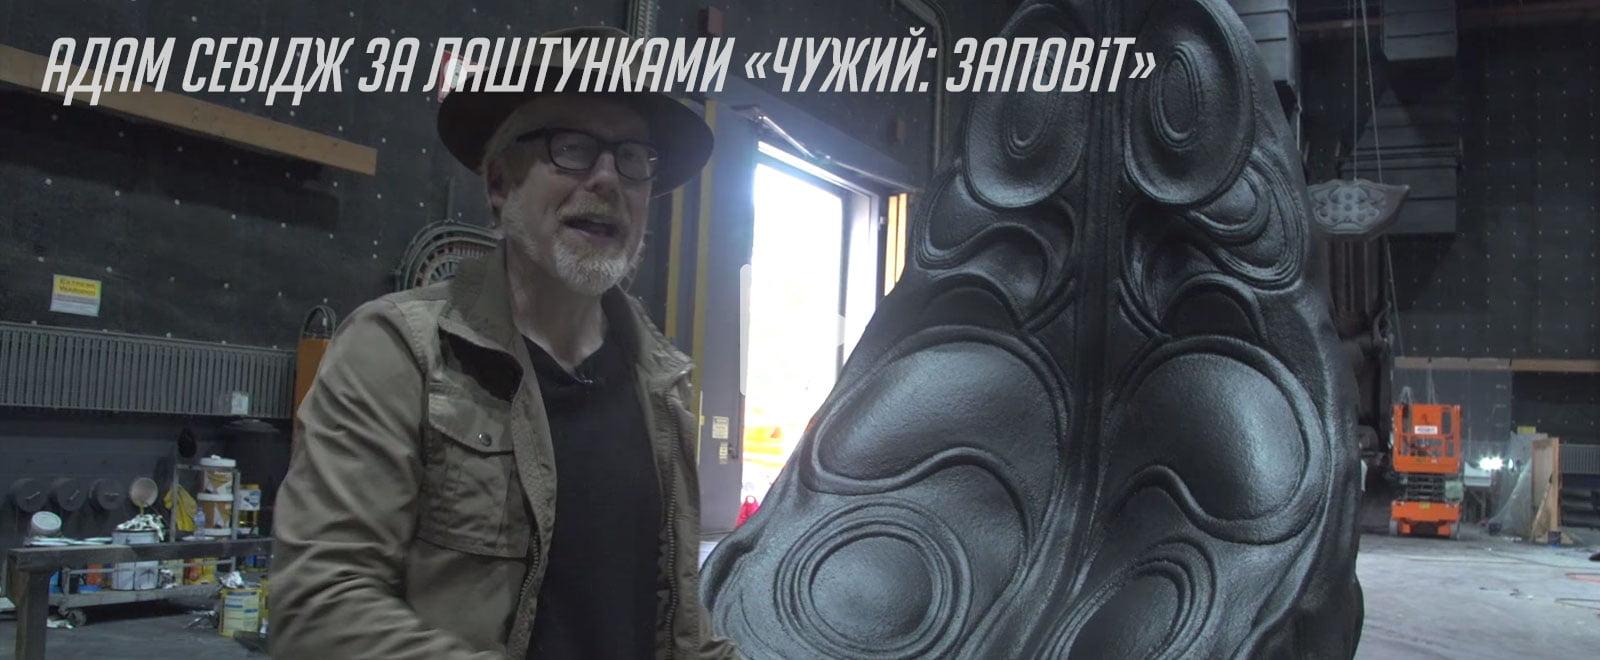 Чужий: Заповіт / Alien: Covenant (2017)